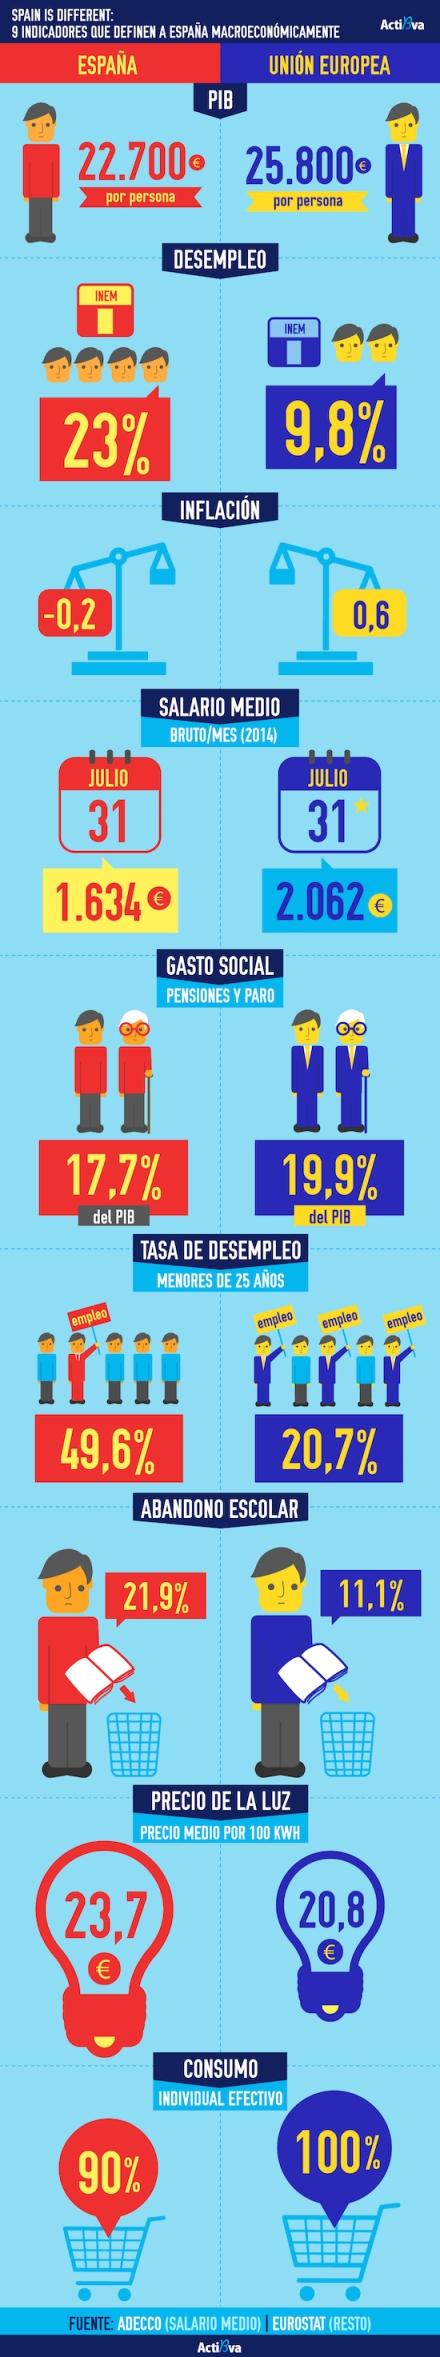 Spain is diferent 2015